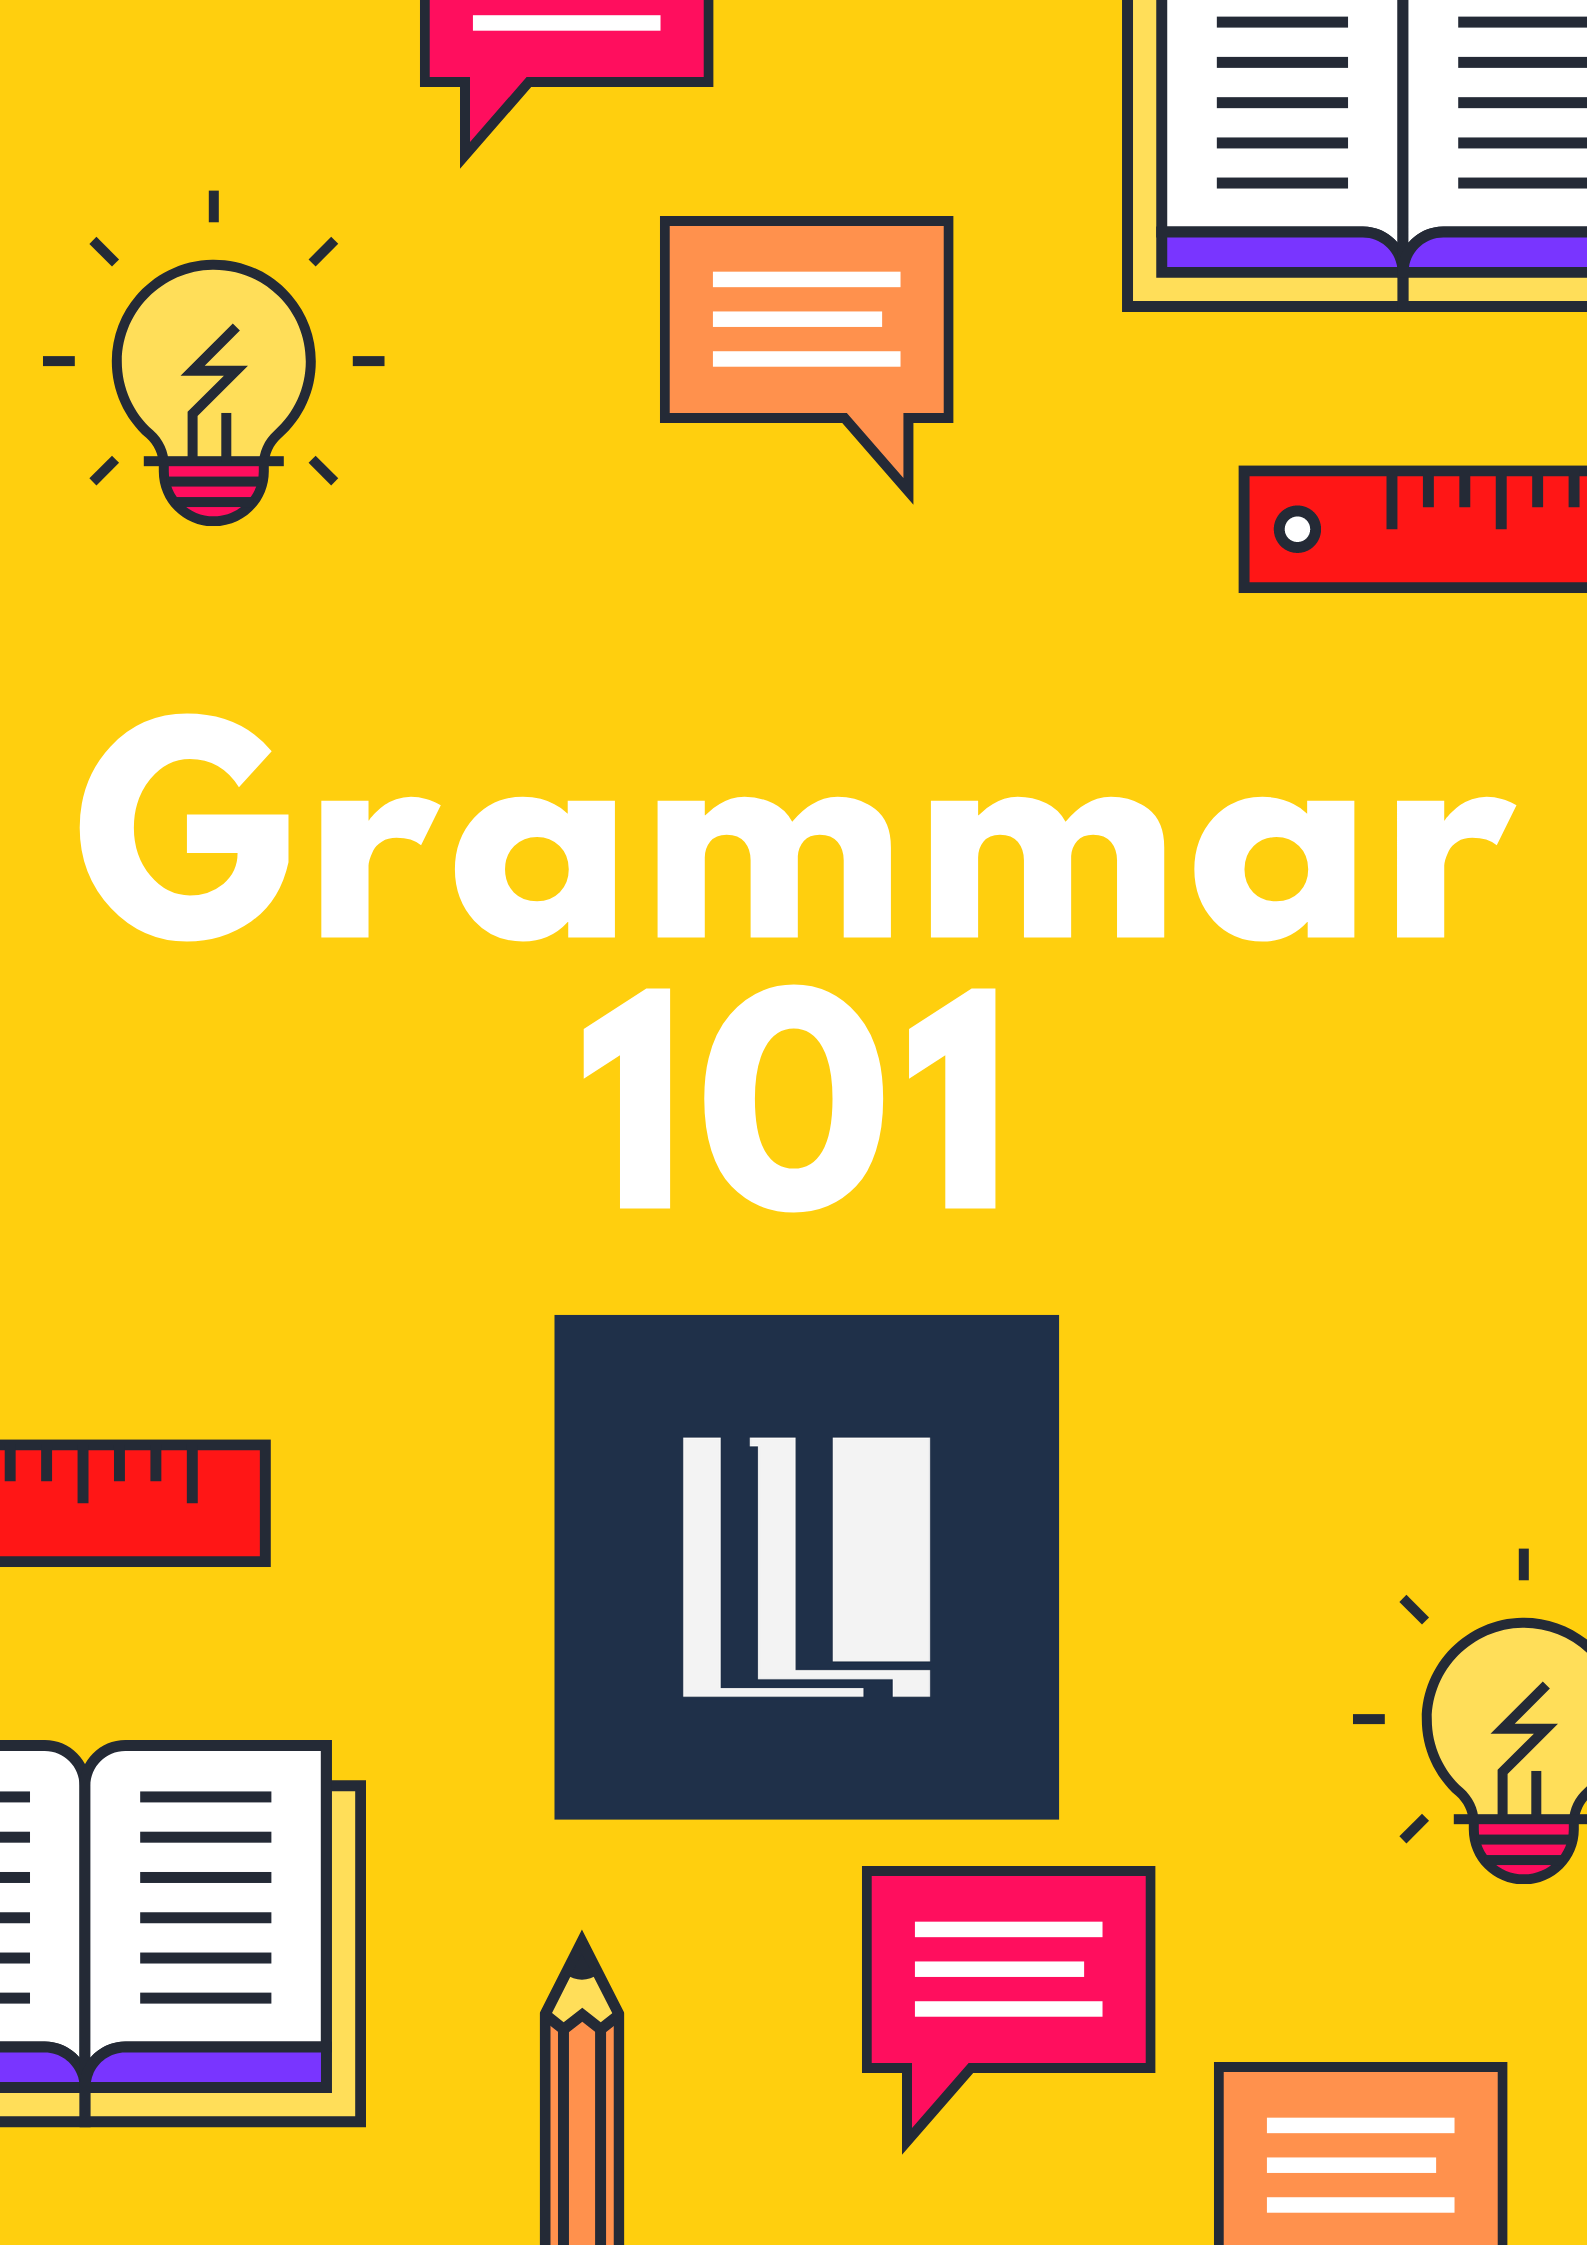 Grammar 101 Part 2 (October 2020)